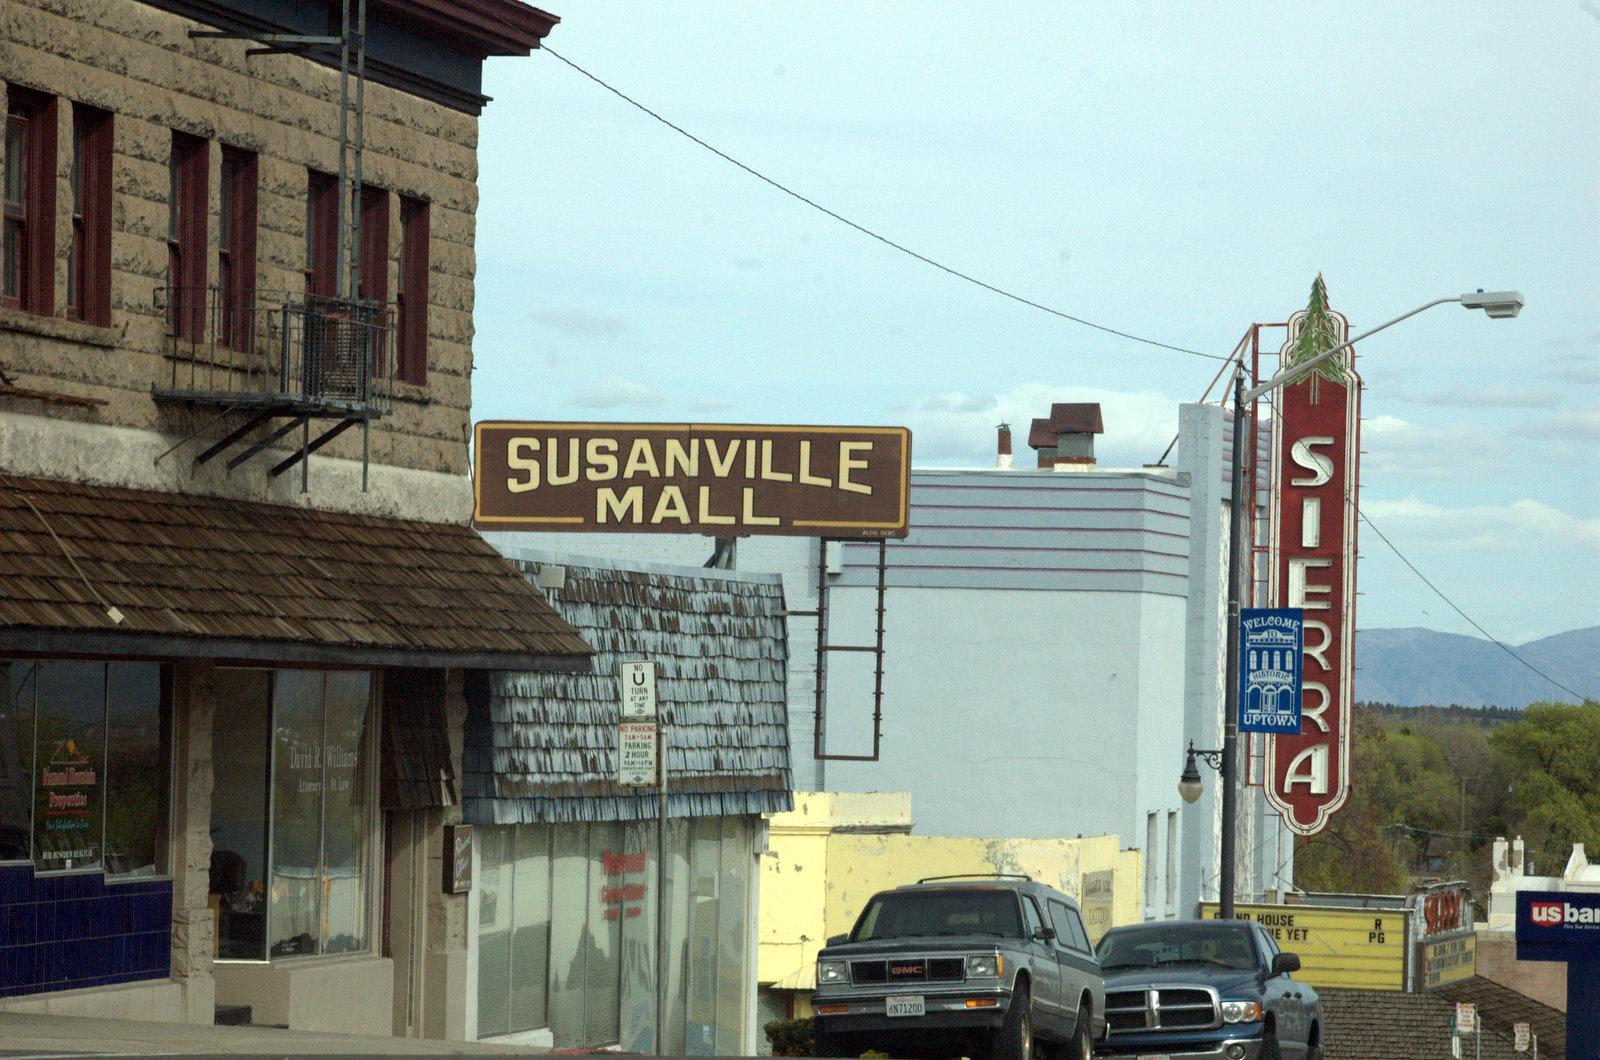 Susanville (CA) United States  City pictures : united states census bureau, an quot incorporatedSearch susanville ...